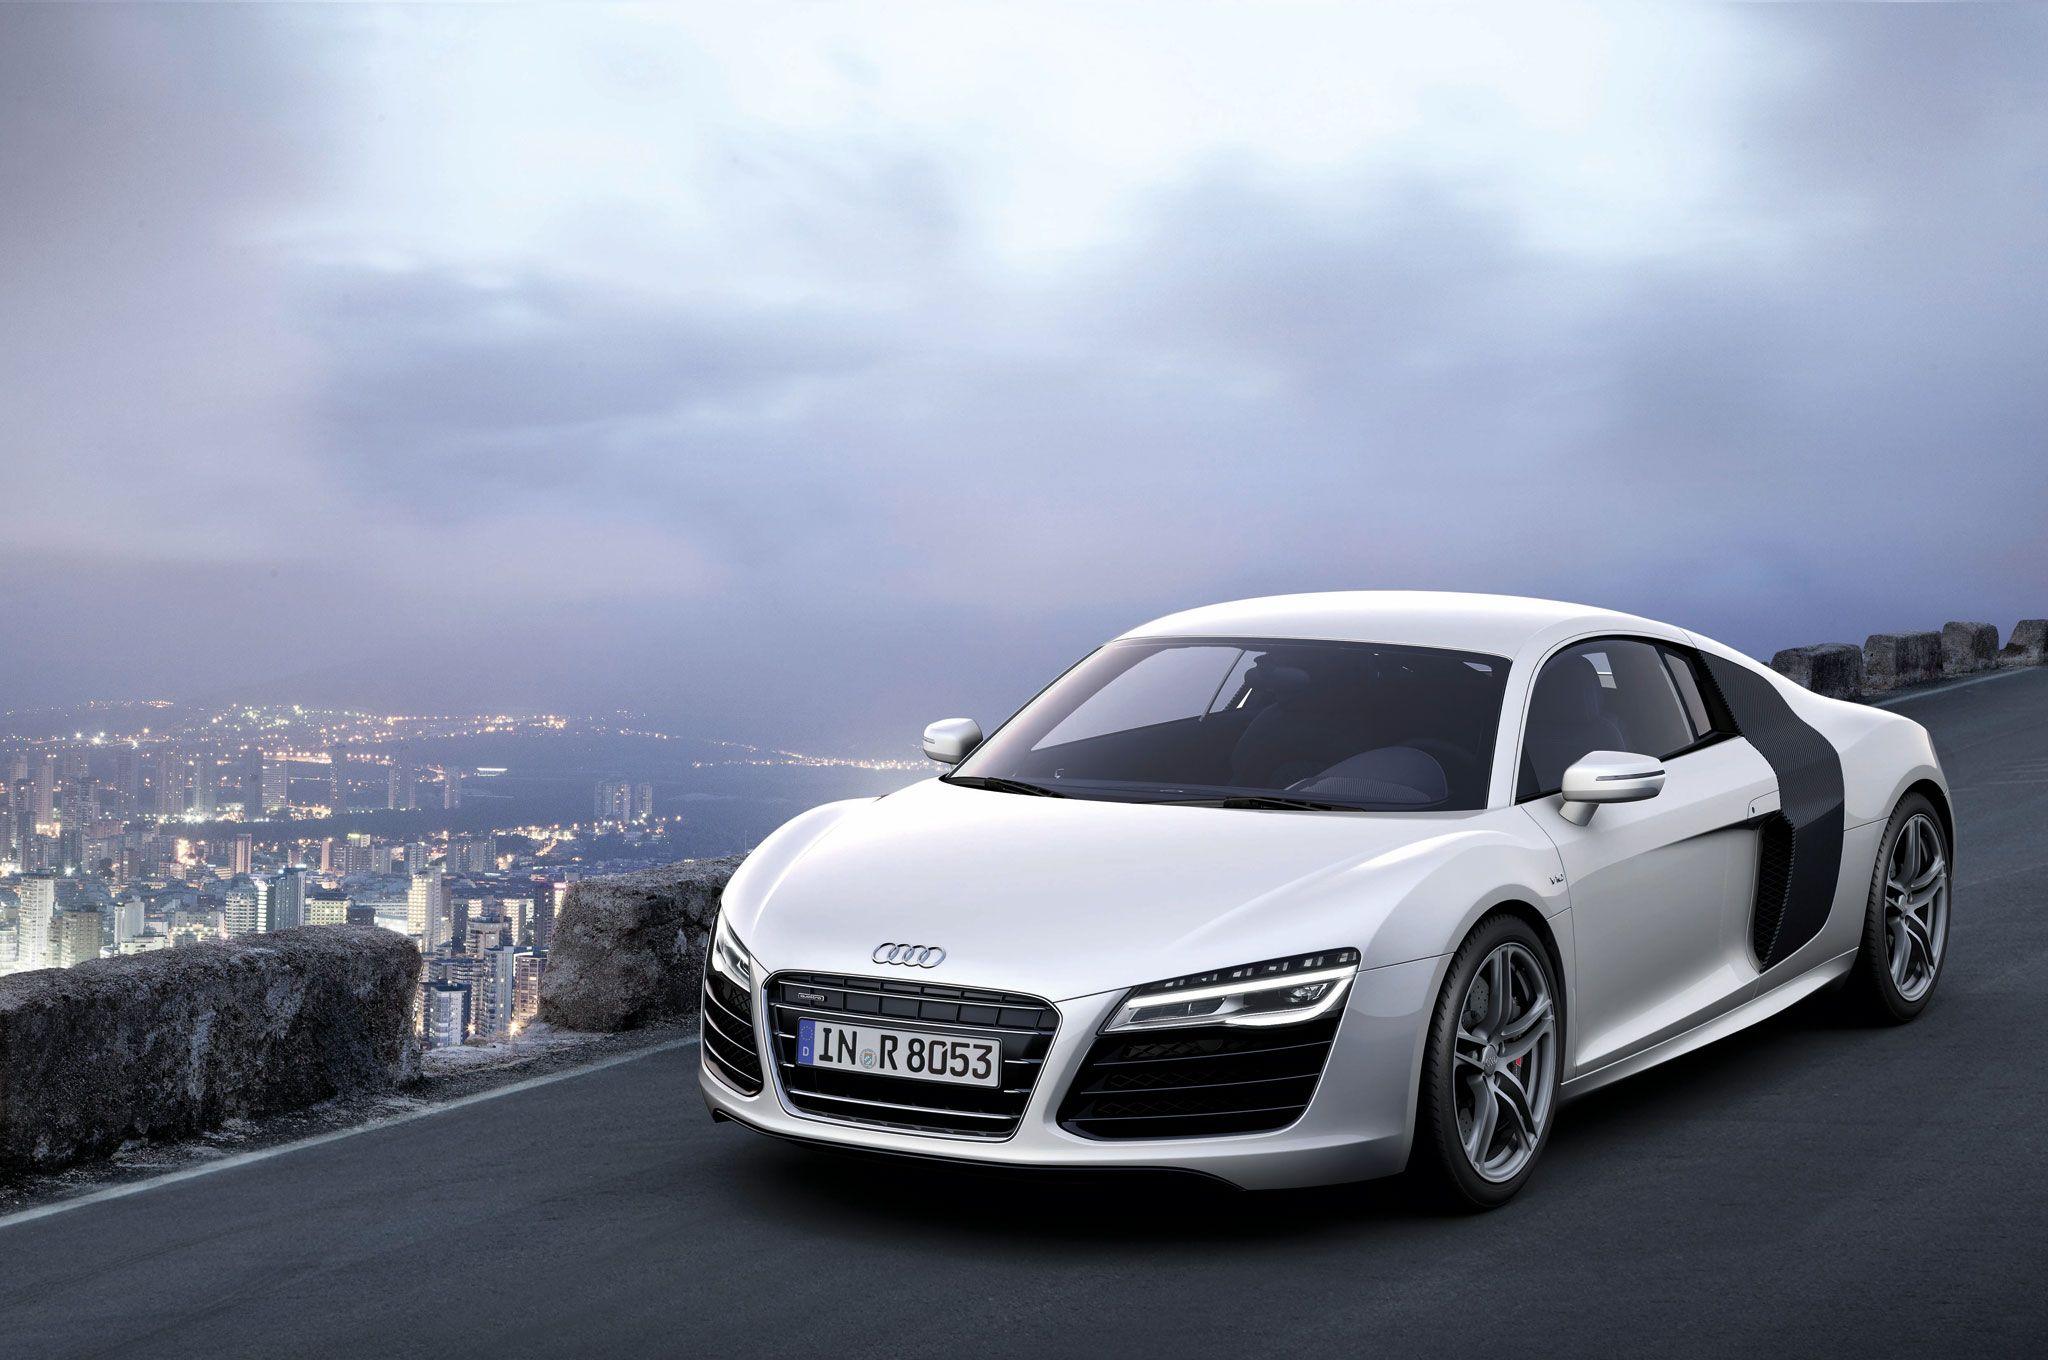 Audi R8 Spyder V10 Plus Wallpaper Hd Resolution Audi R8